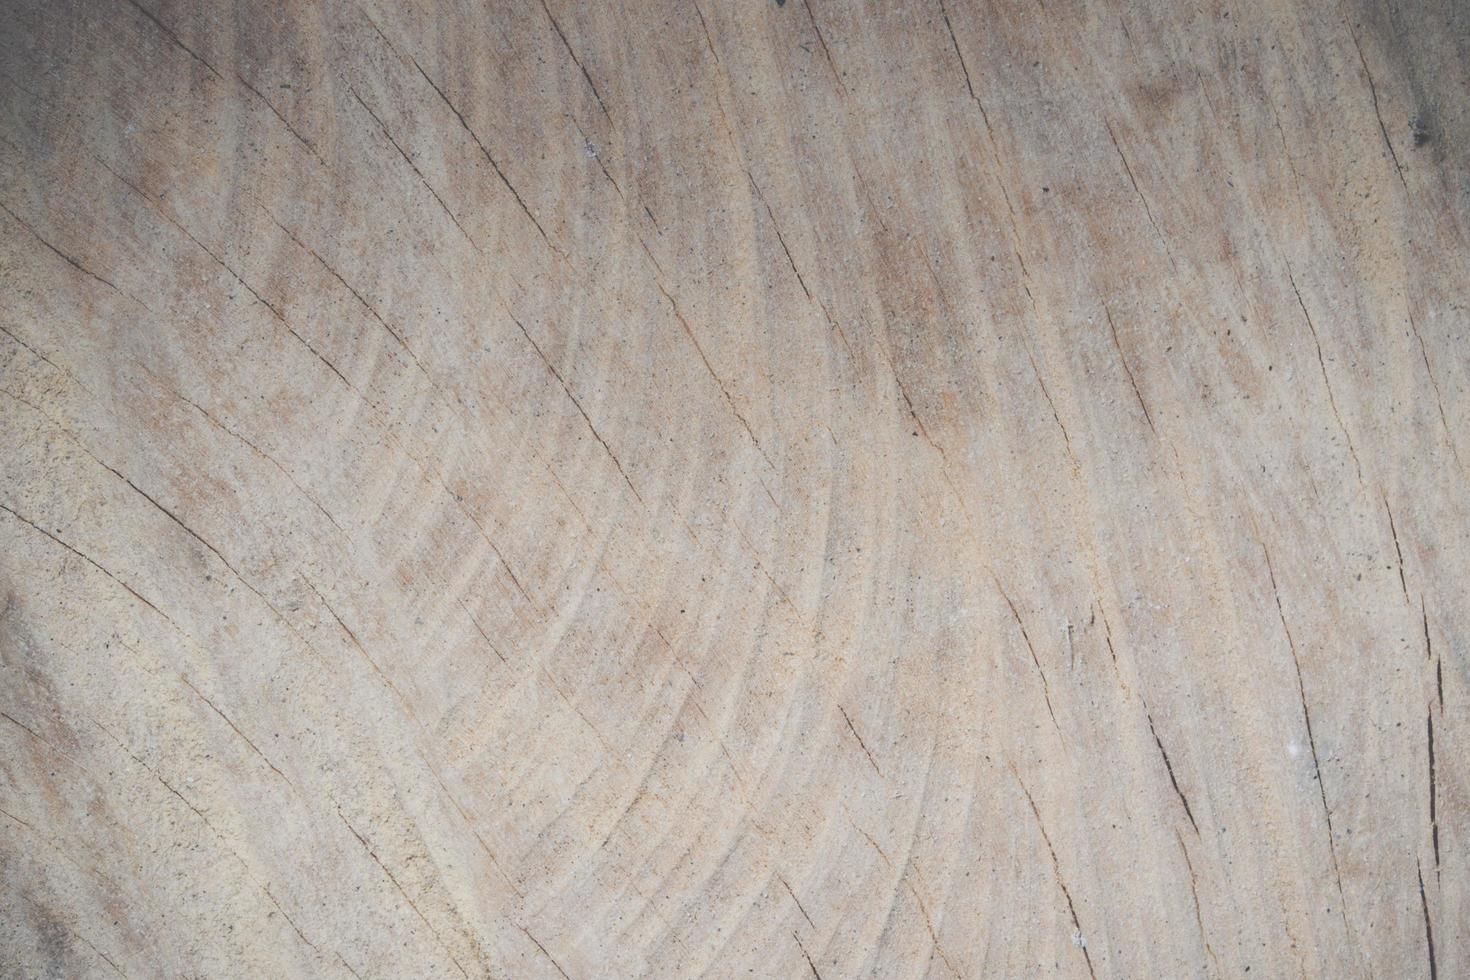 Wood texture background photo